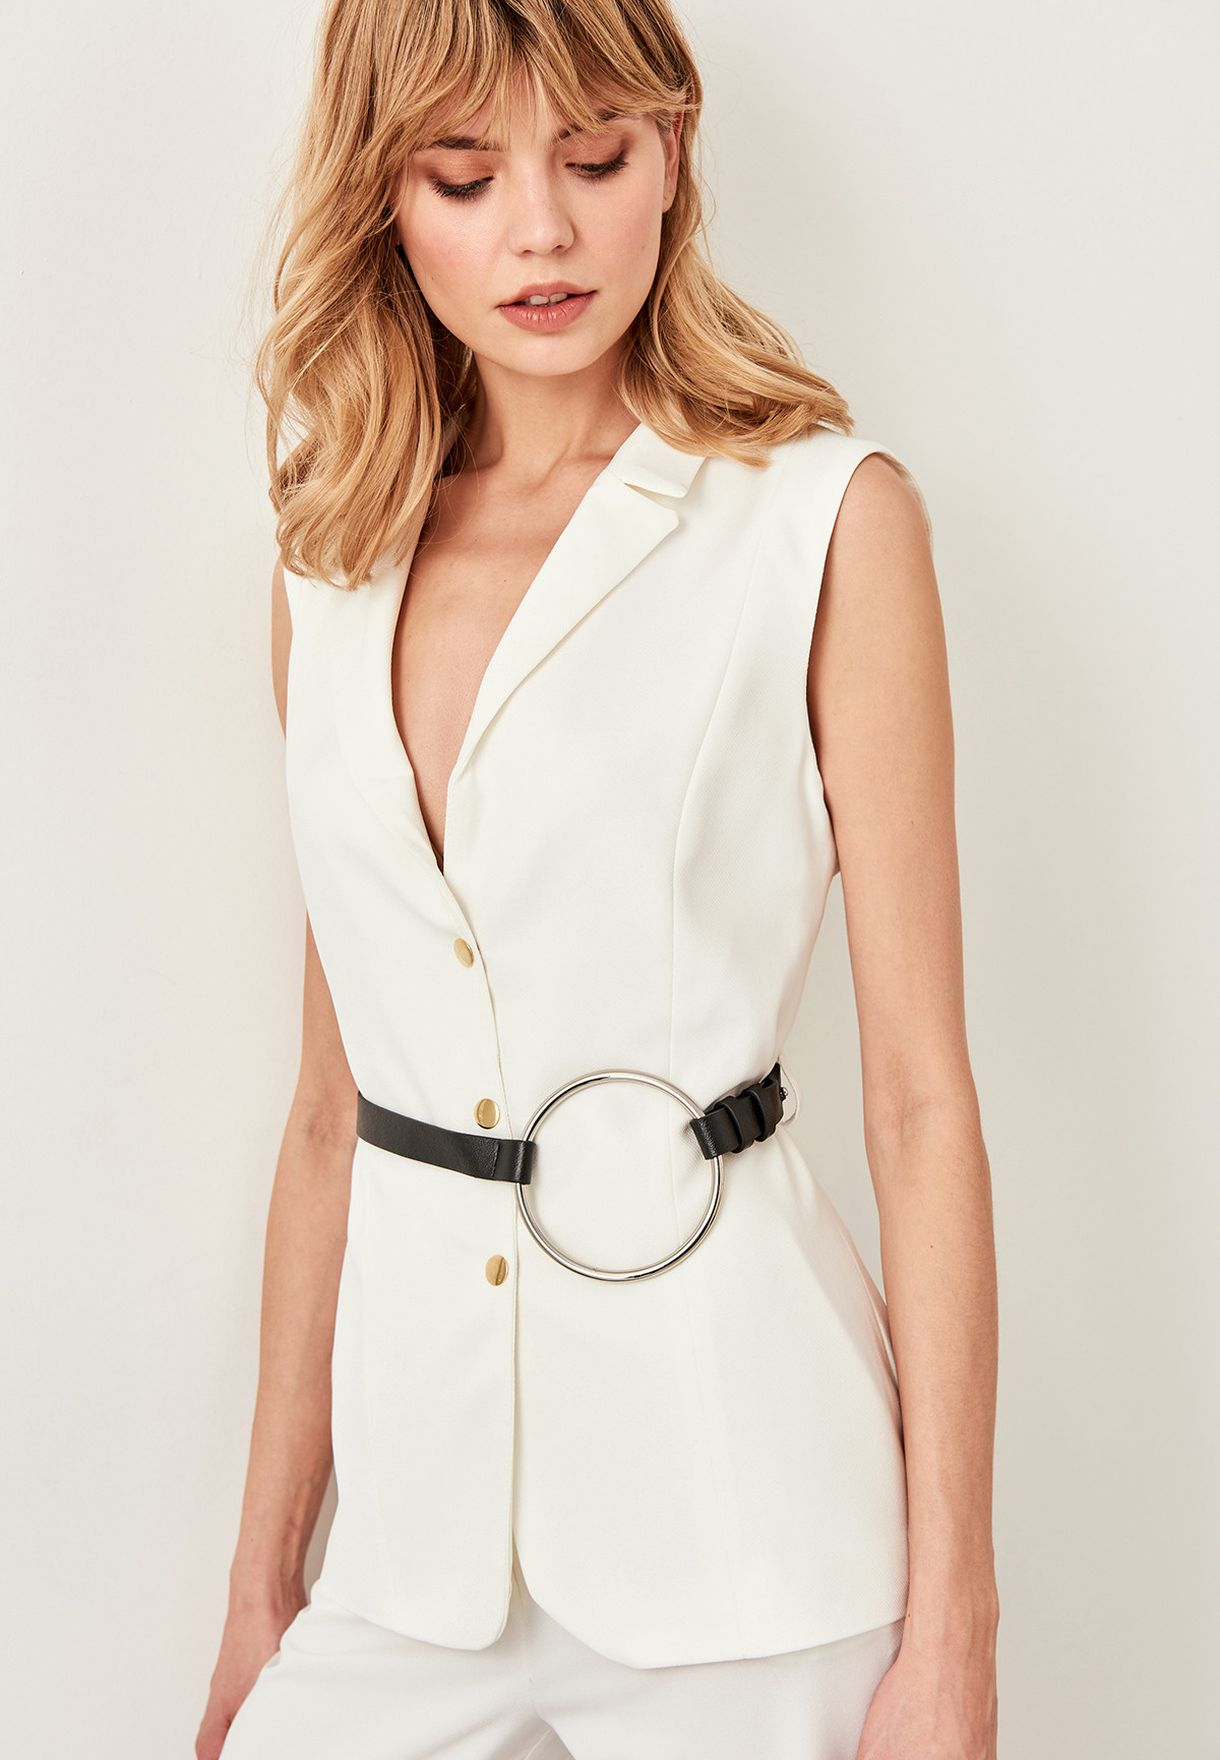 3899a2c29c8 Shop Trendyol black Black Ring Detailed Waist Belt TWOSS19PL0027 for Women  in Kuwait - 27680ACBEIJP